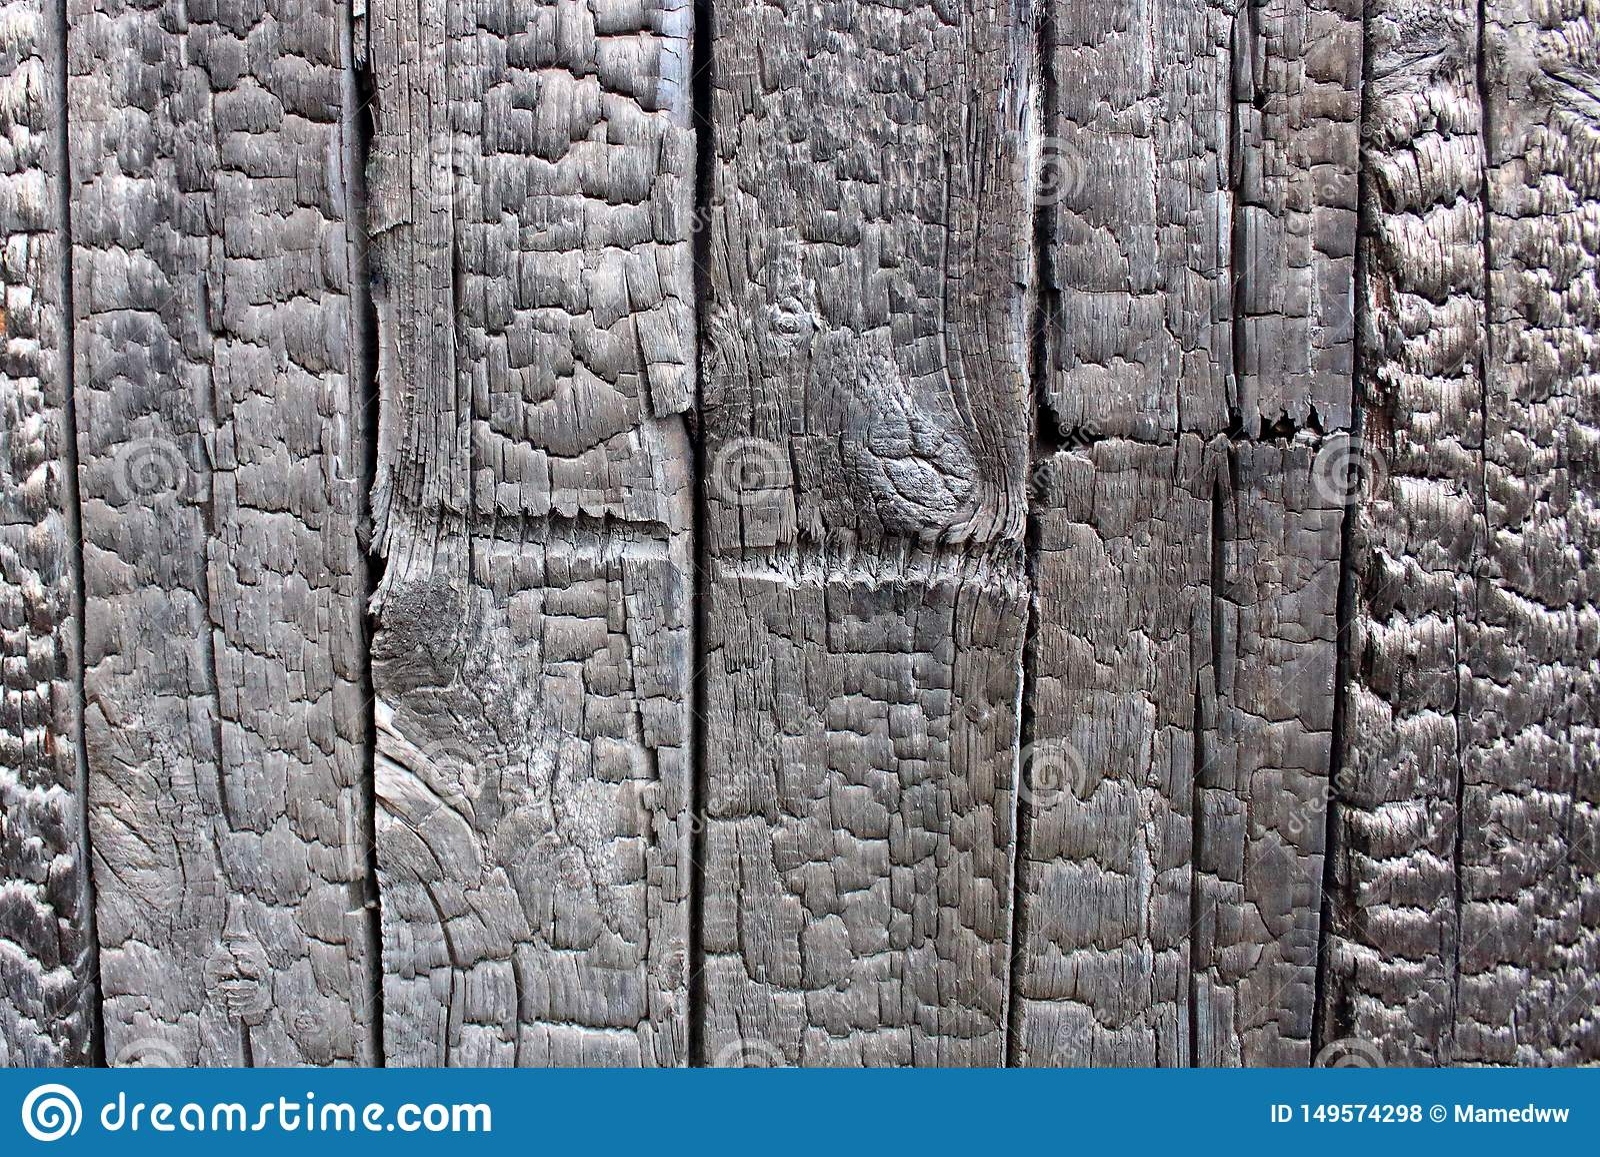 Burnt wood wall texture